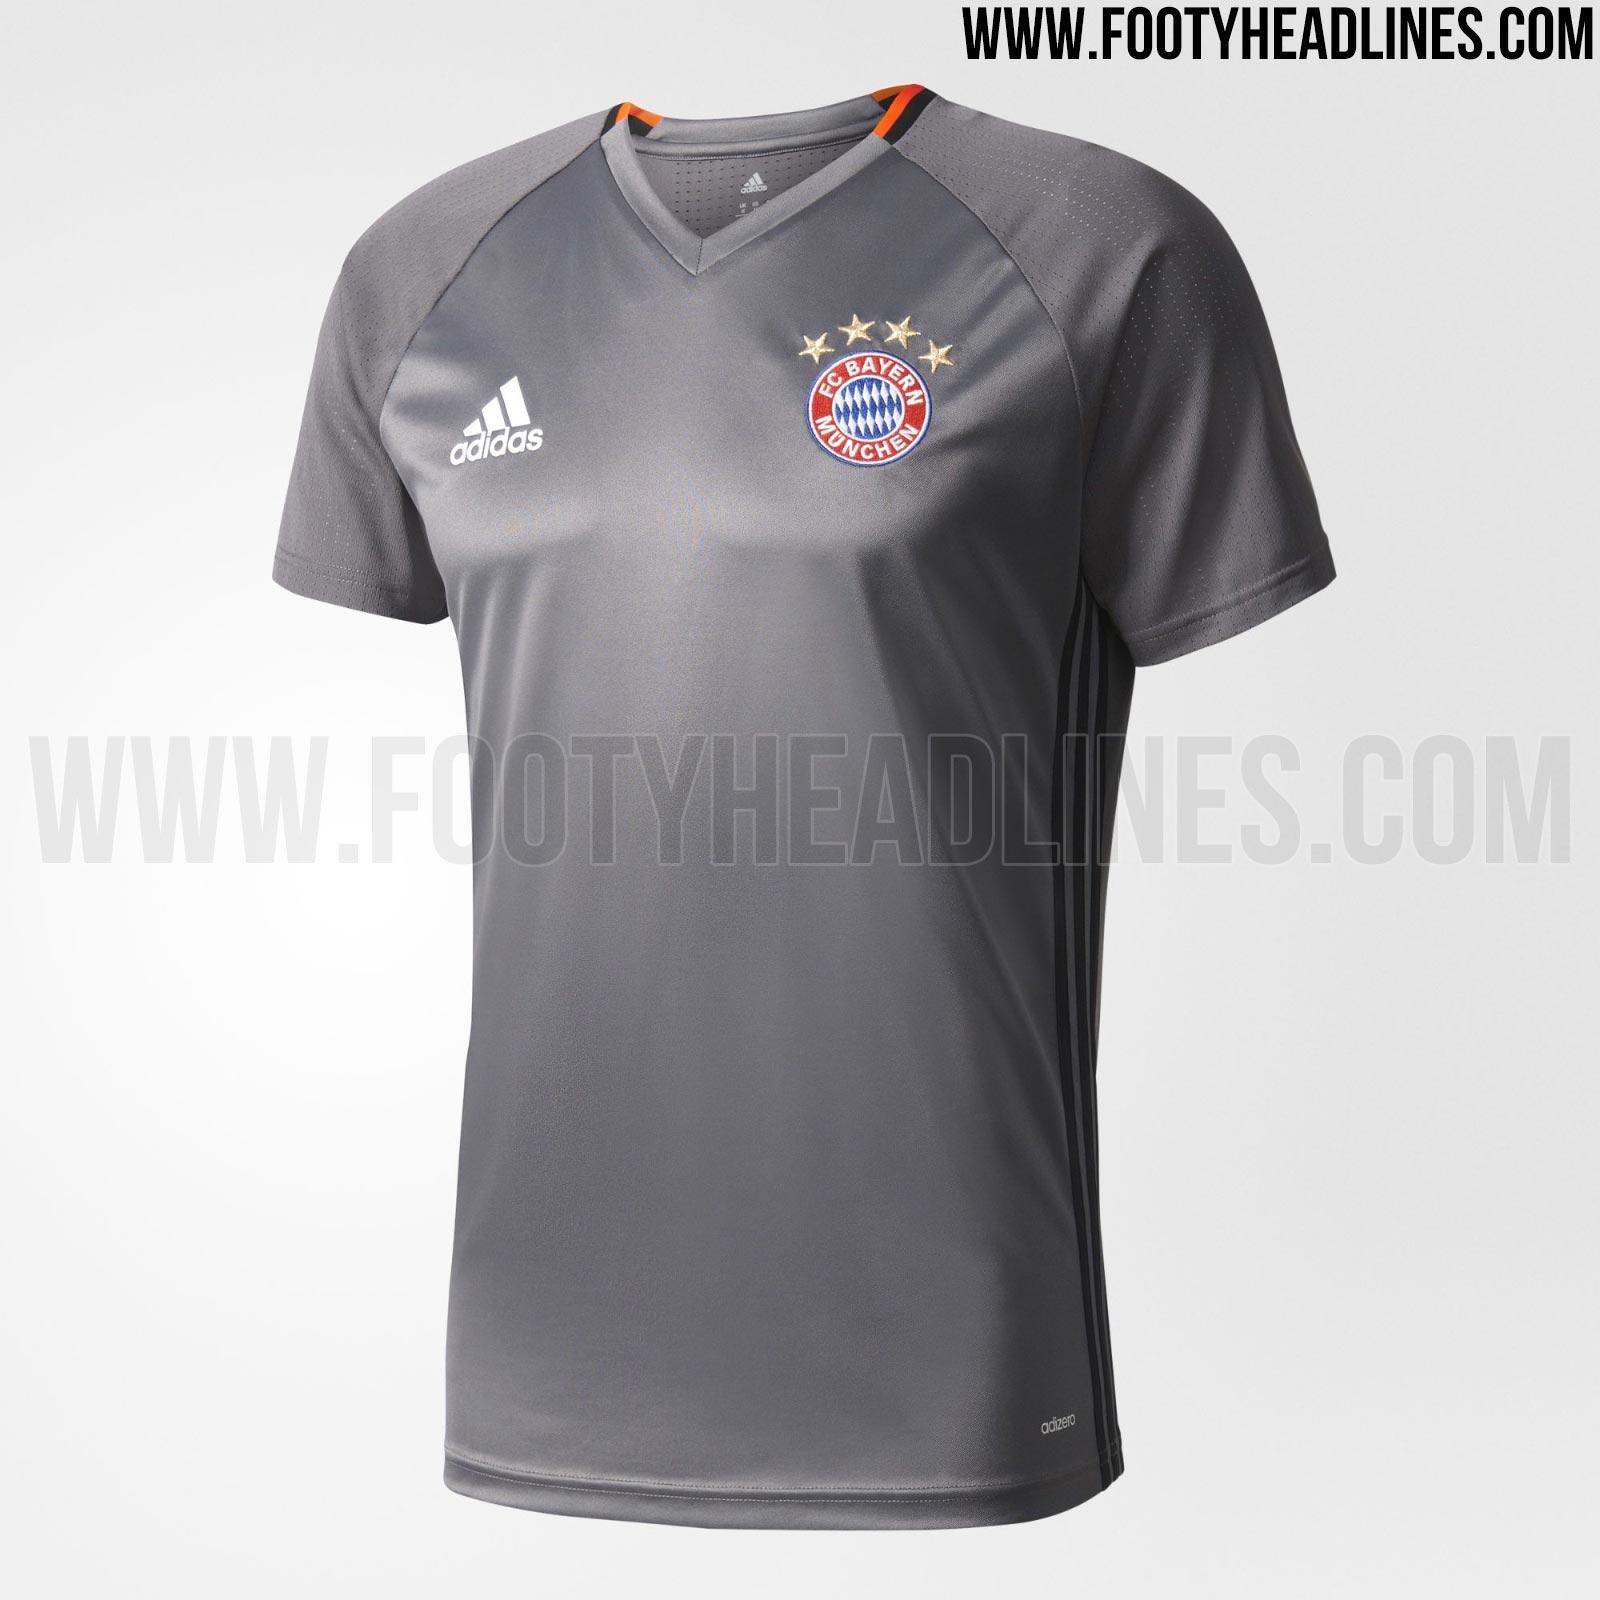 Bayern Munich 2017 Training Shirt Leaked - Footy Headlines d18ec2181